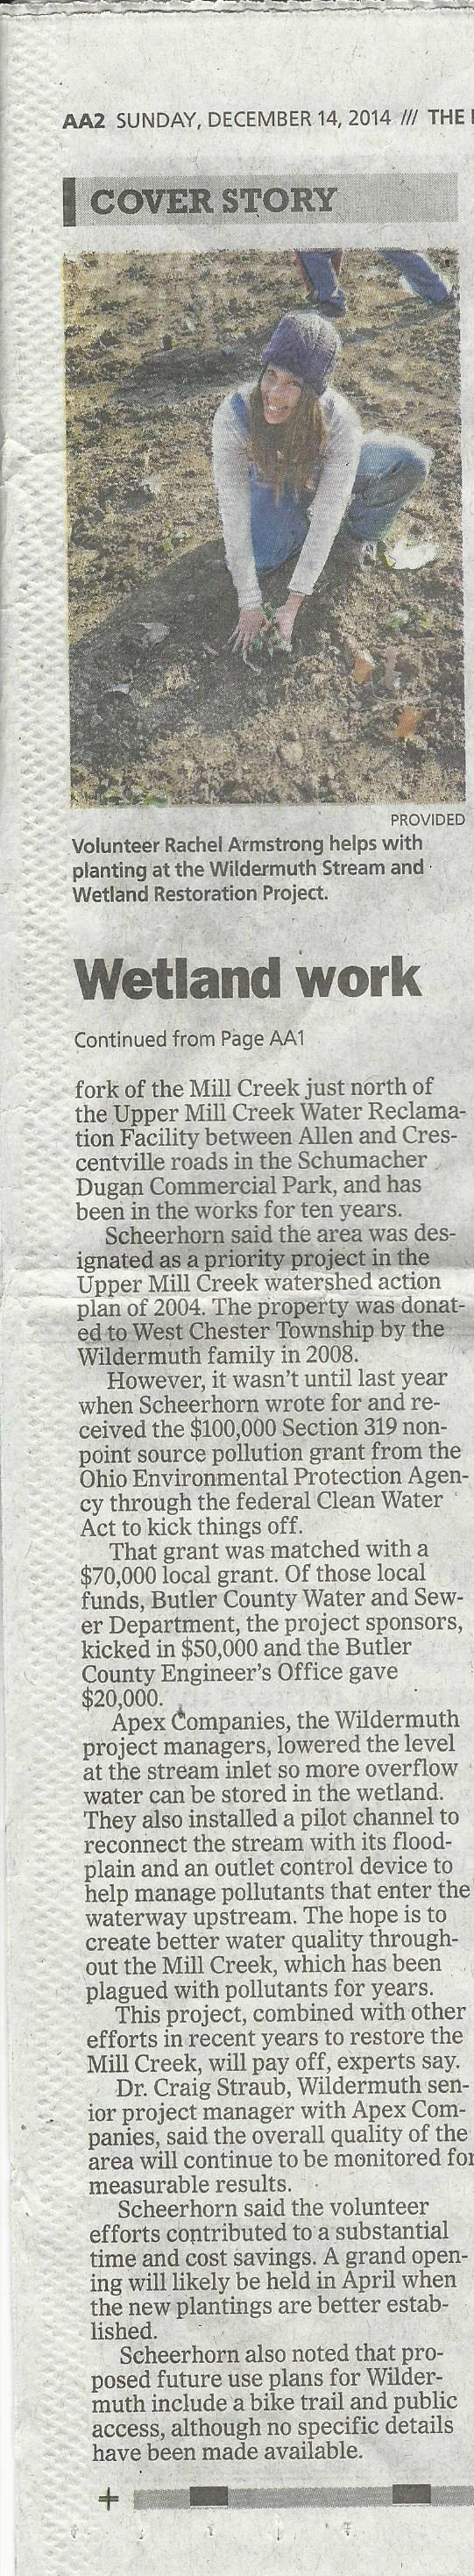 Cincinnati Enquirer_Wetland Warriors_12.14.14__crop2.jpg